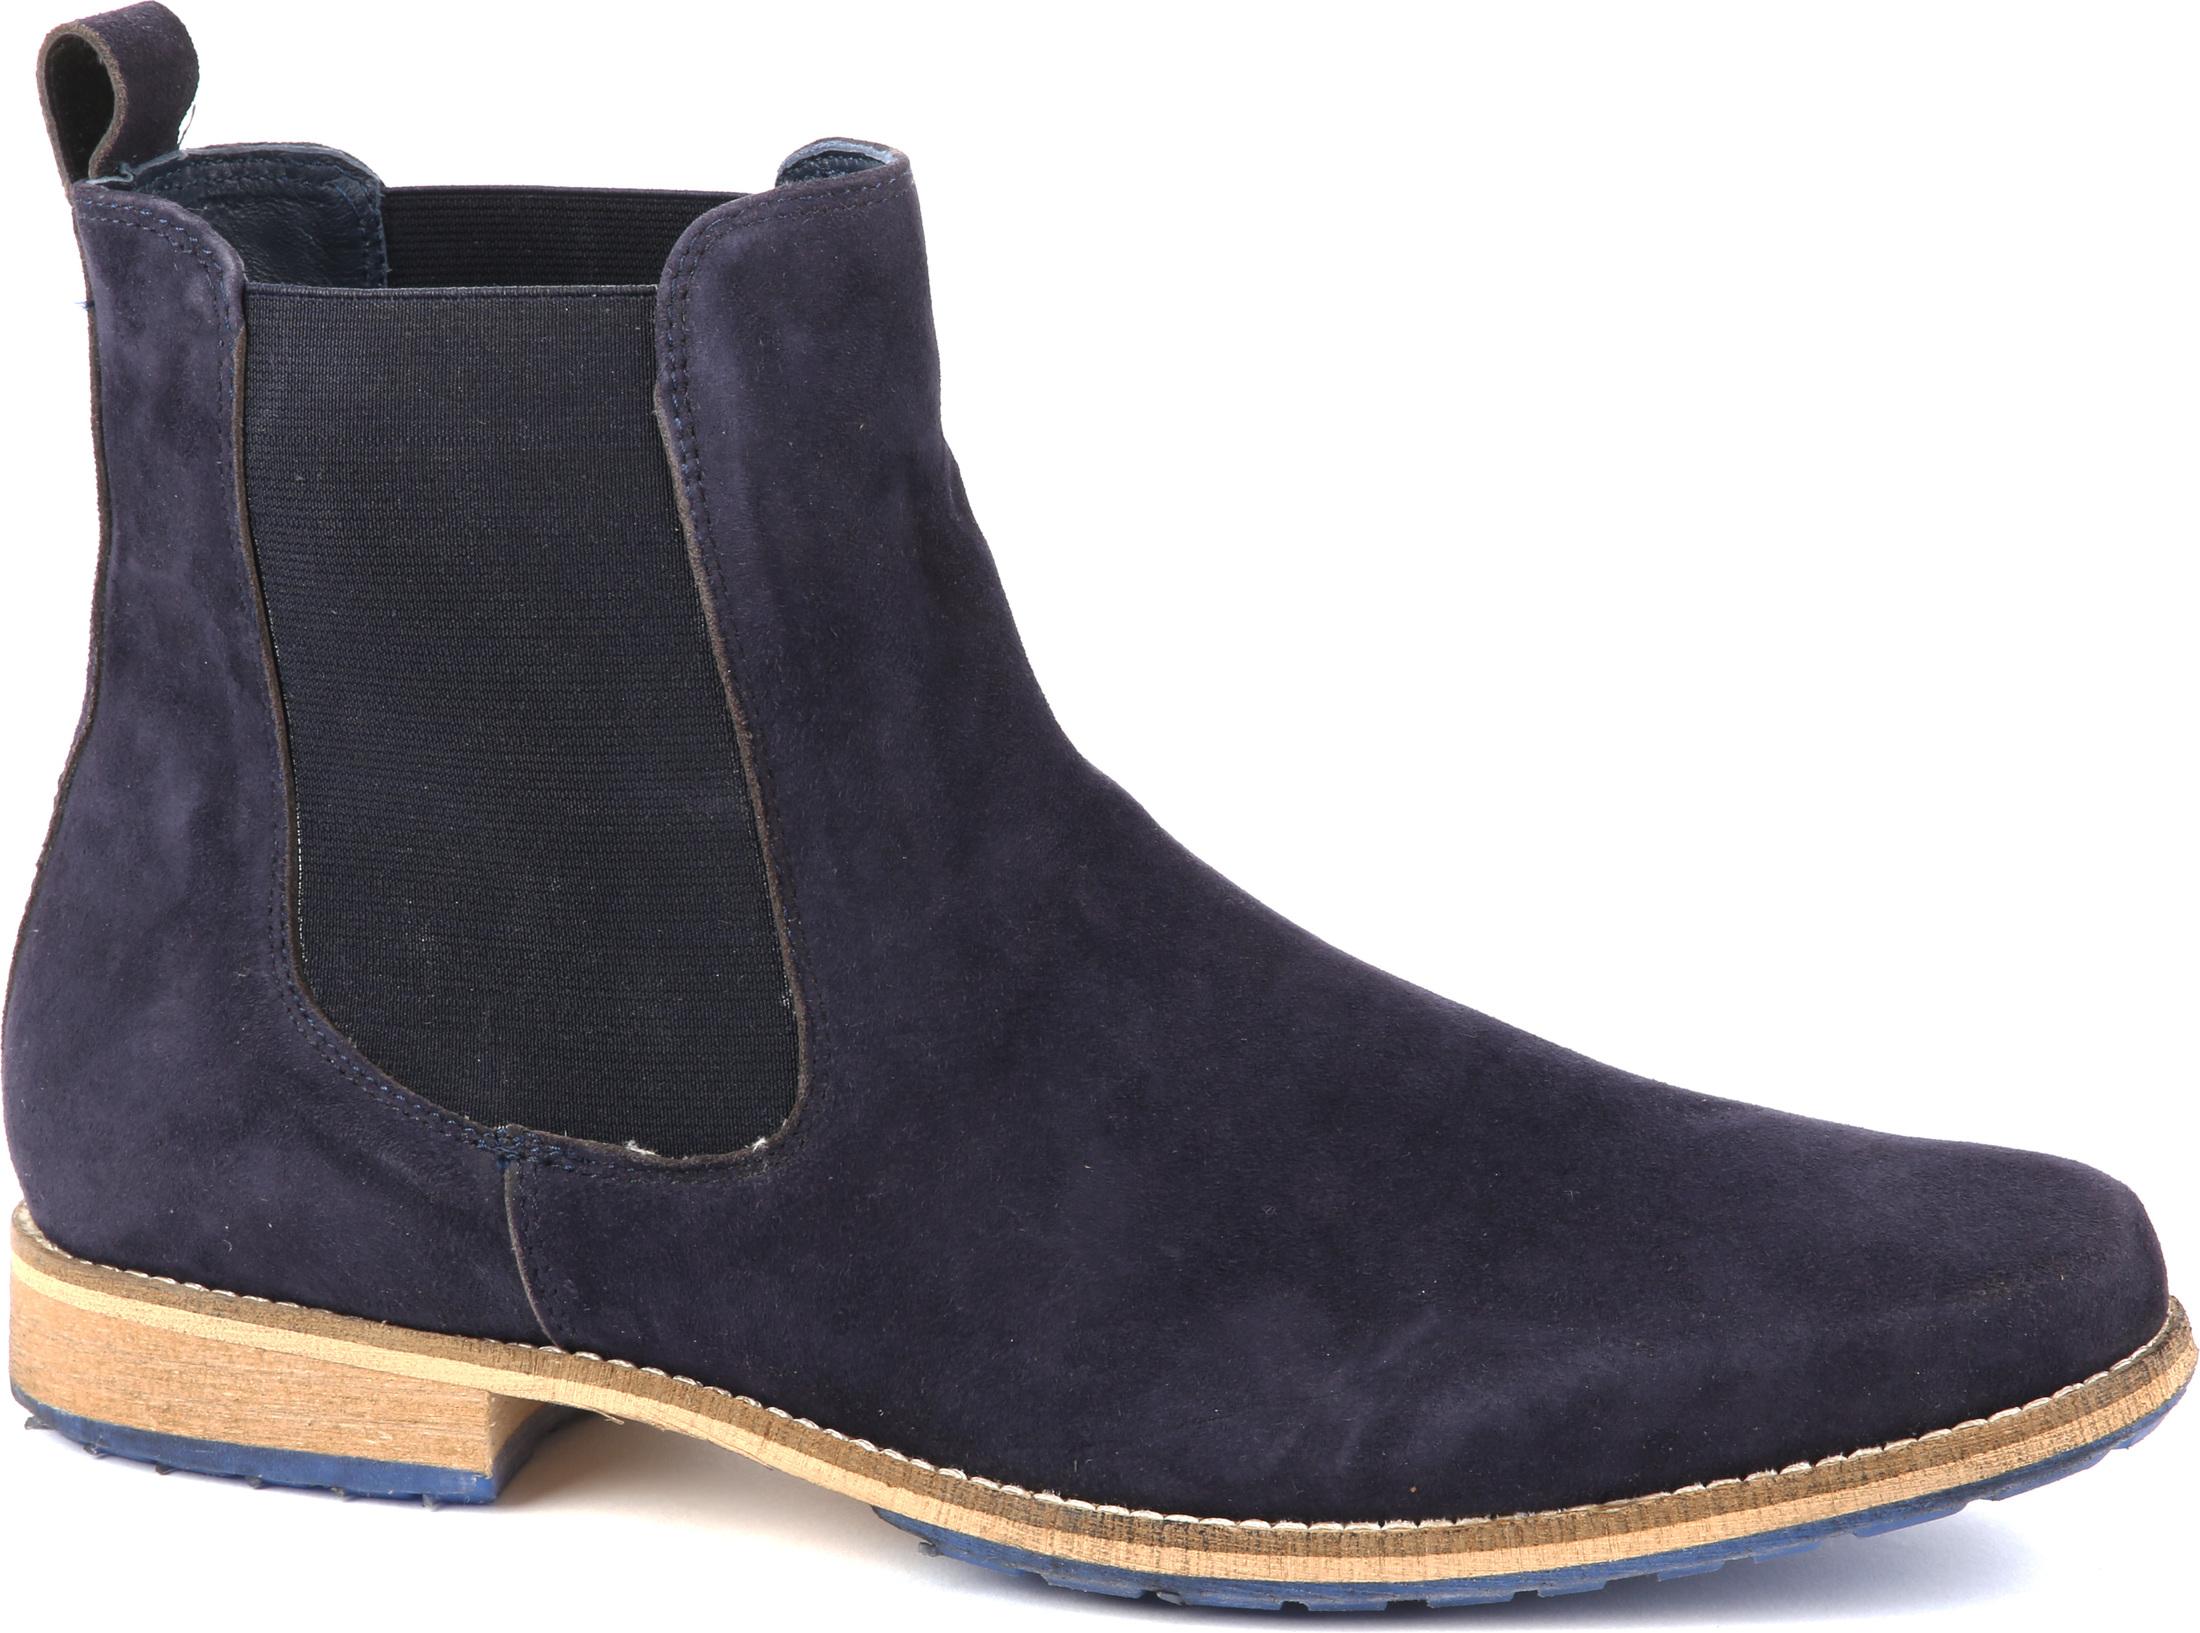 Suede Boots Chelsea Navy